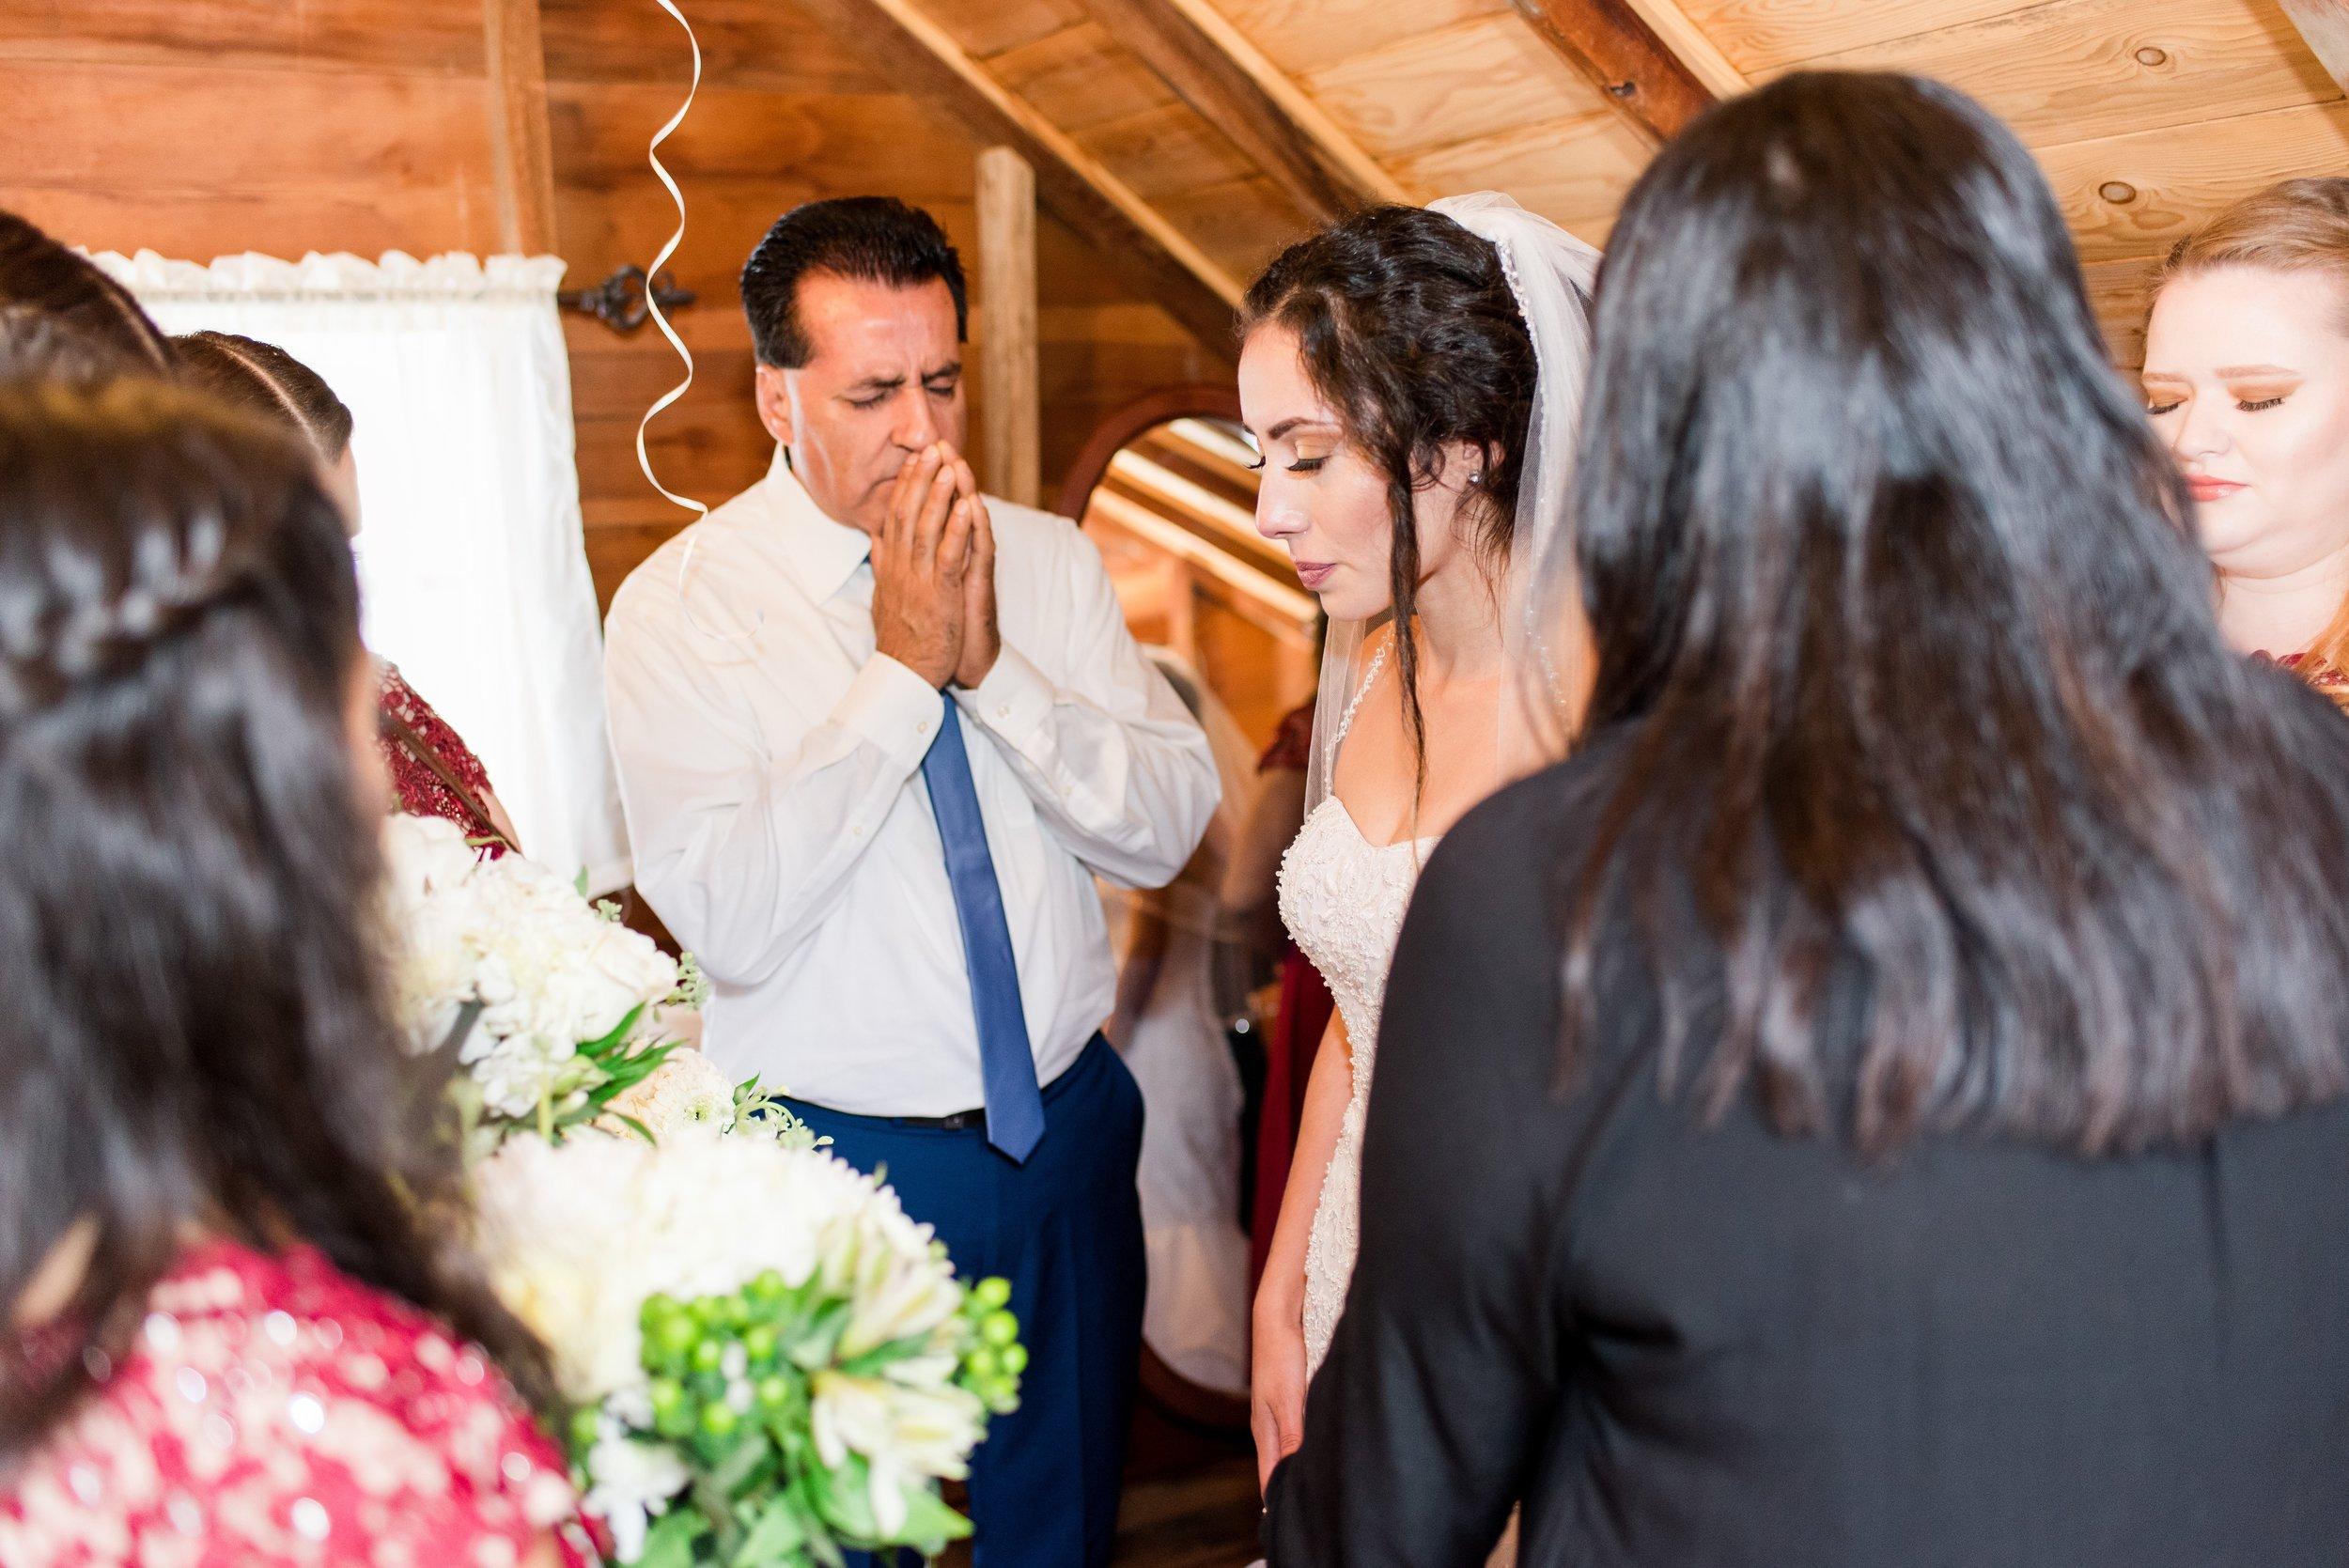 Wenatchee, WA Hampton Hideaway White Barn Wedding - Wenatchee, Washington Wedding Photographer - Morgan Tayler Photo & Design - Tri Cities, WA Wedding Photographer